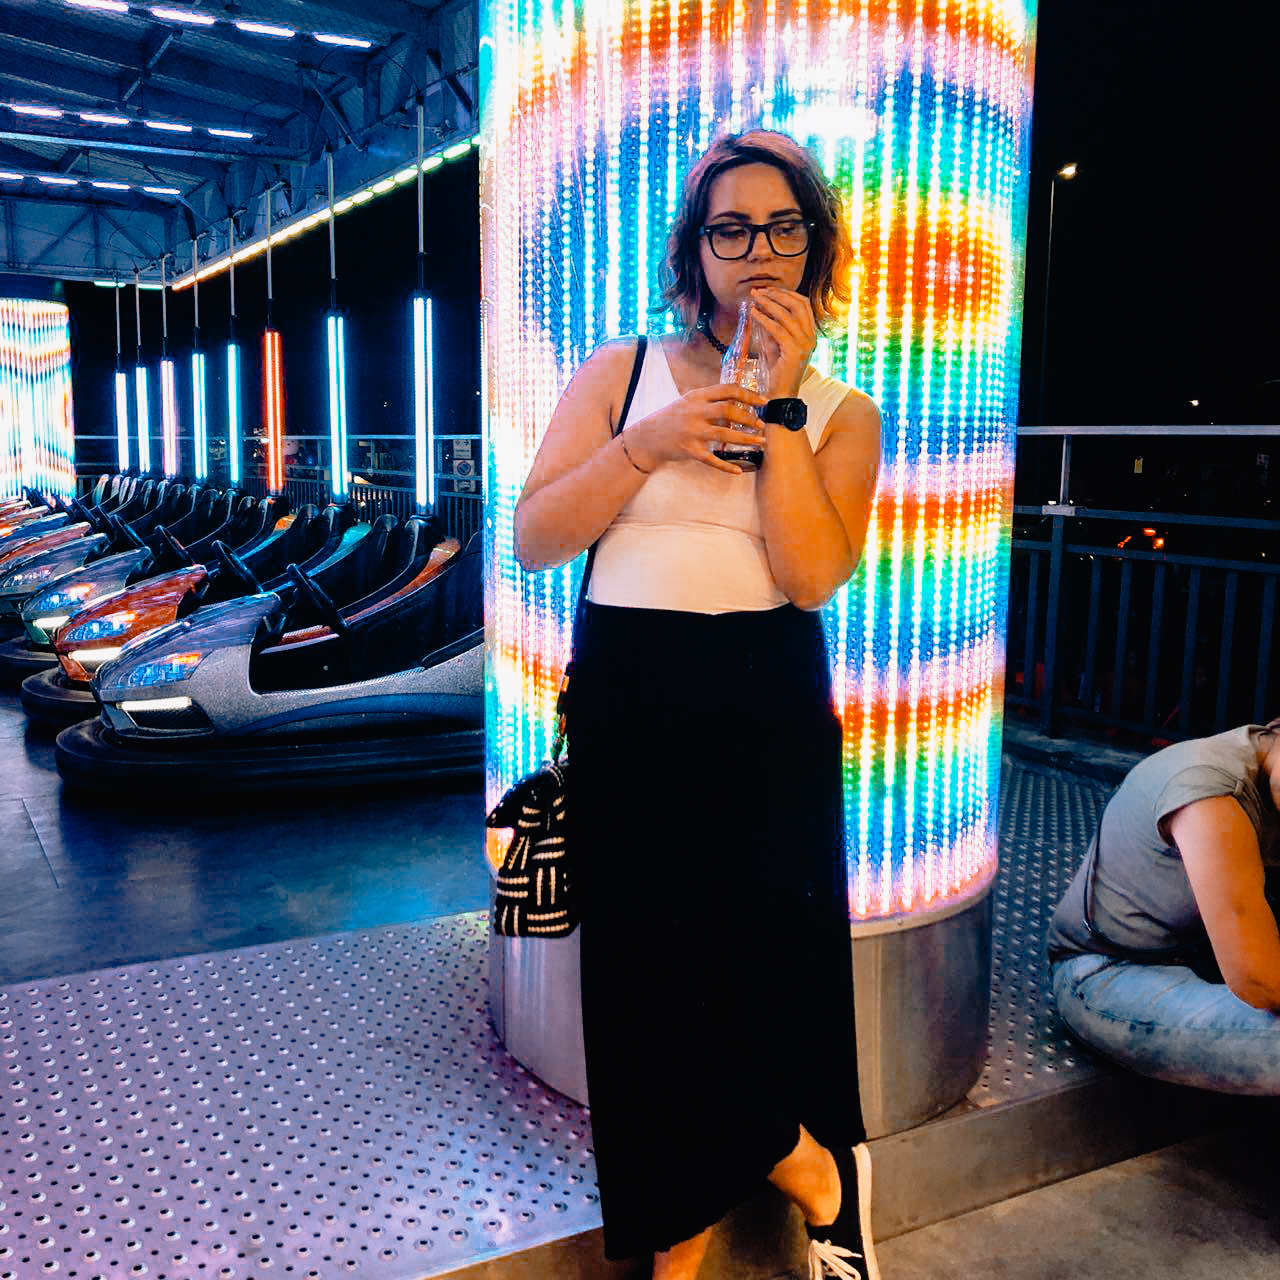 corpo e consapevolezze- www.fashionsobsessions.it - zairadurso - @zairadurso - zaira d'urso - fashionsobsessions - fashion blog- lifestyle blog